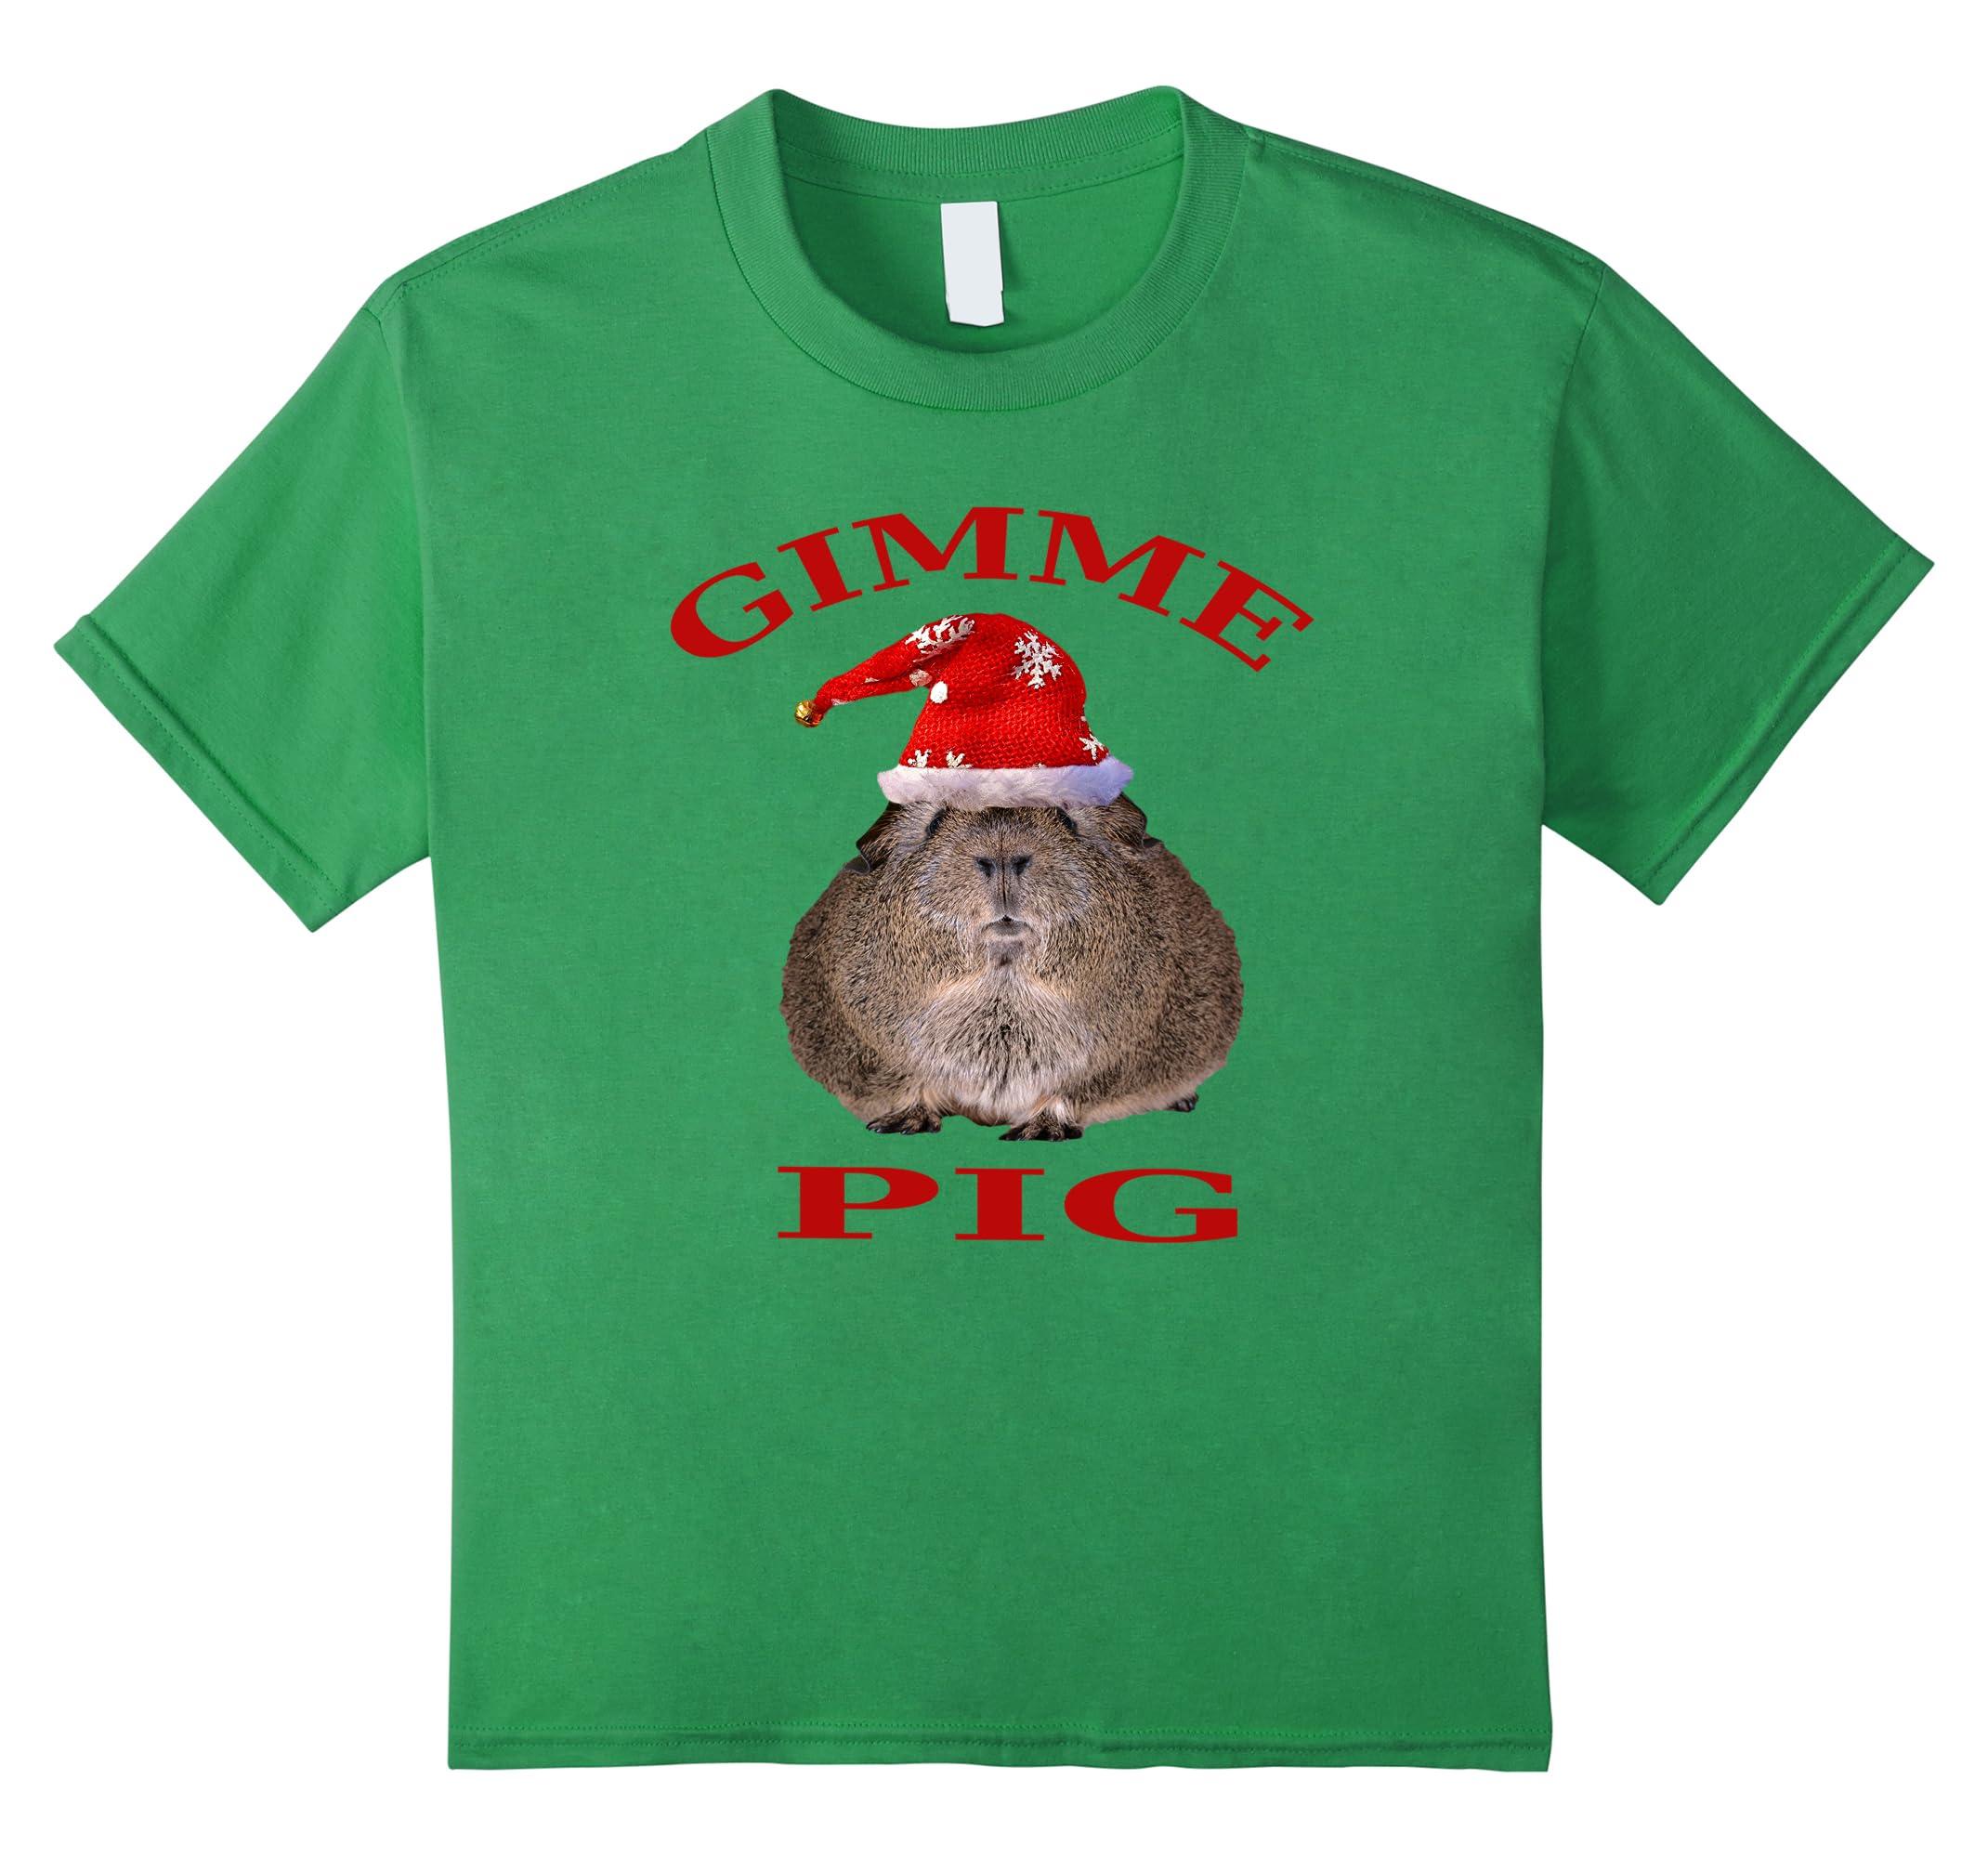 Funny Christmas T Shirts Guinea Clothing-Veotee